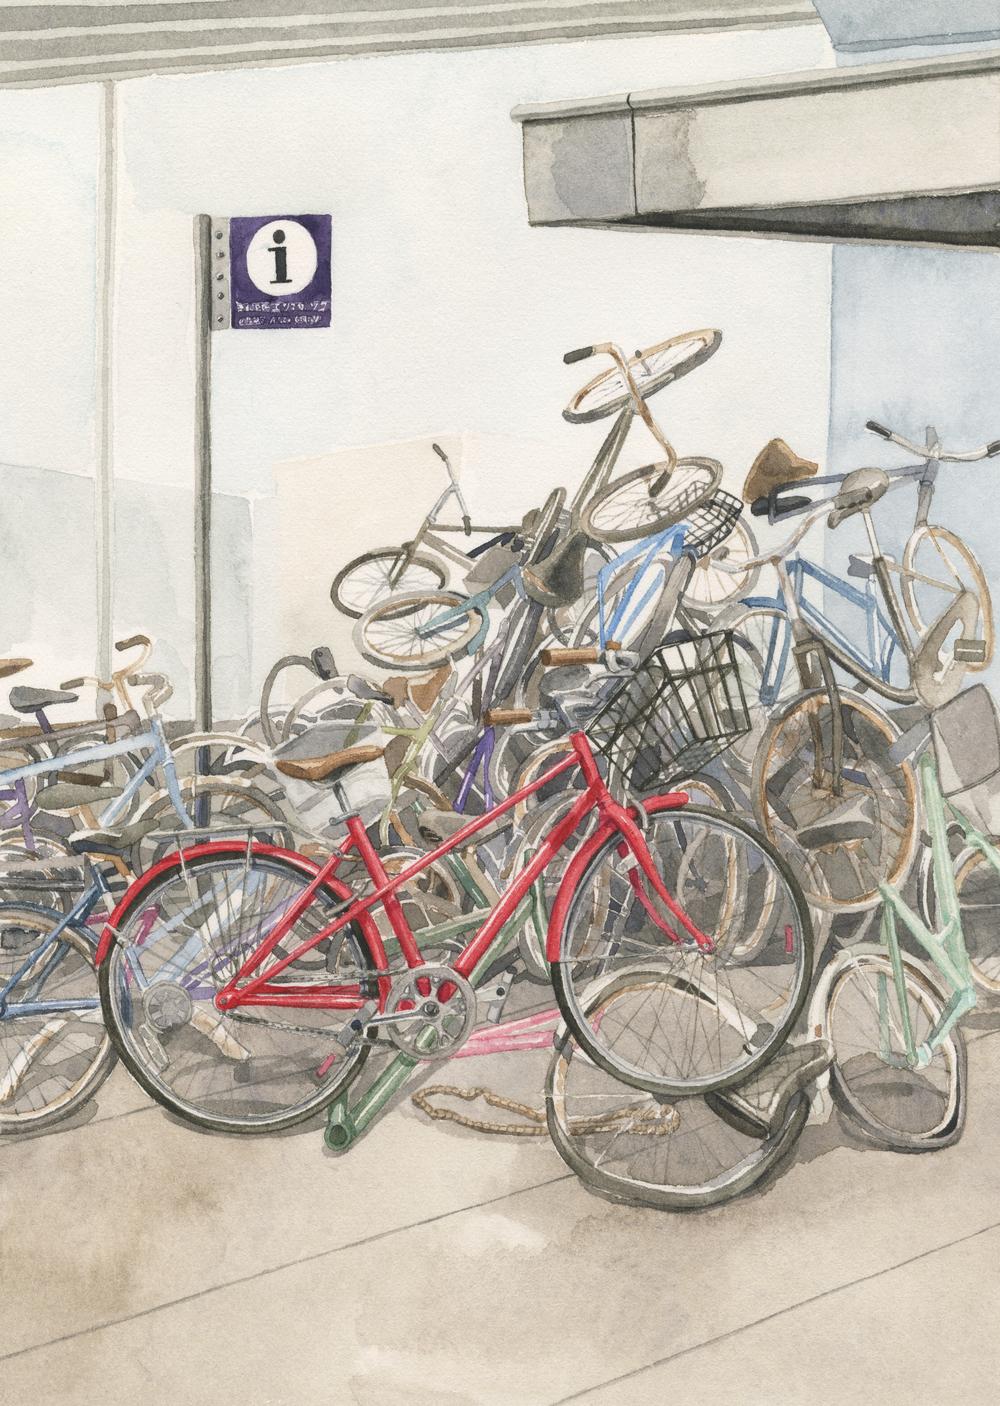 subway-bikes2-web.jpg